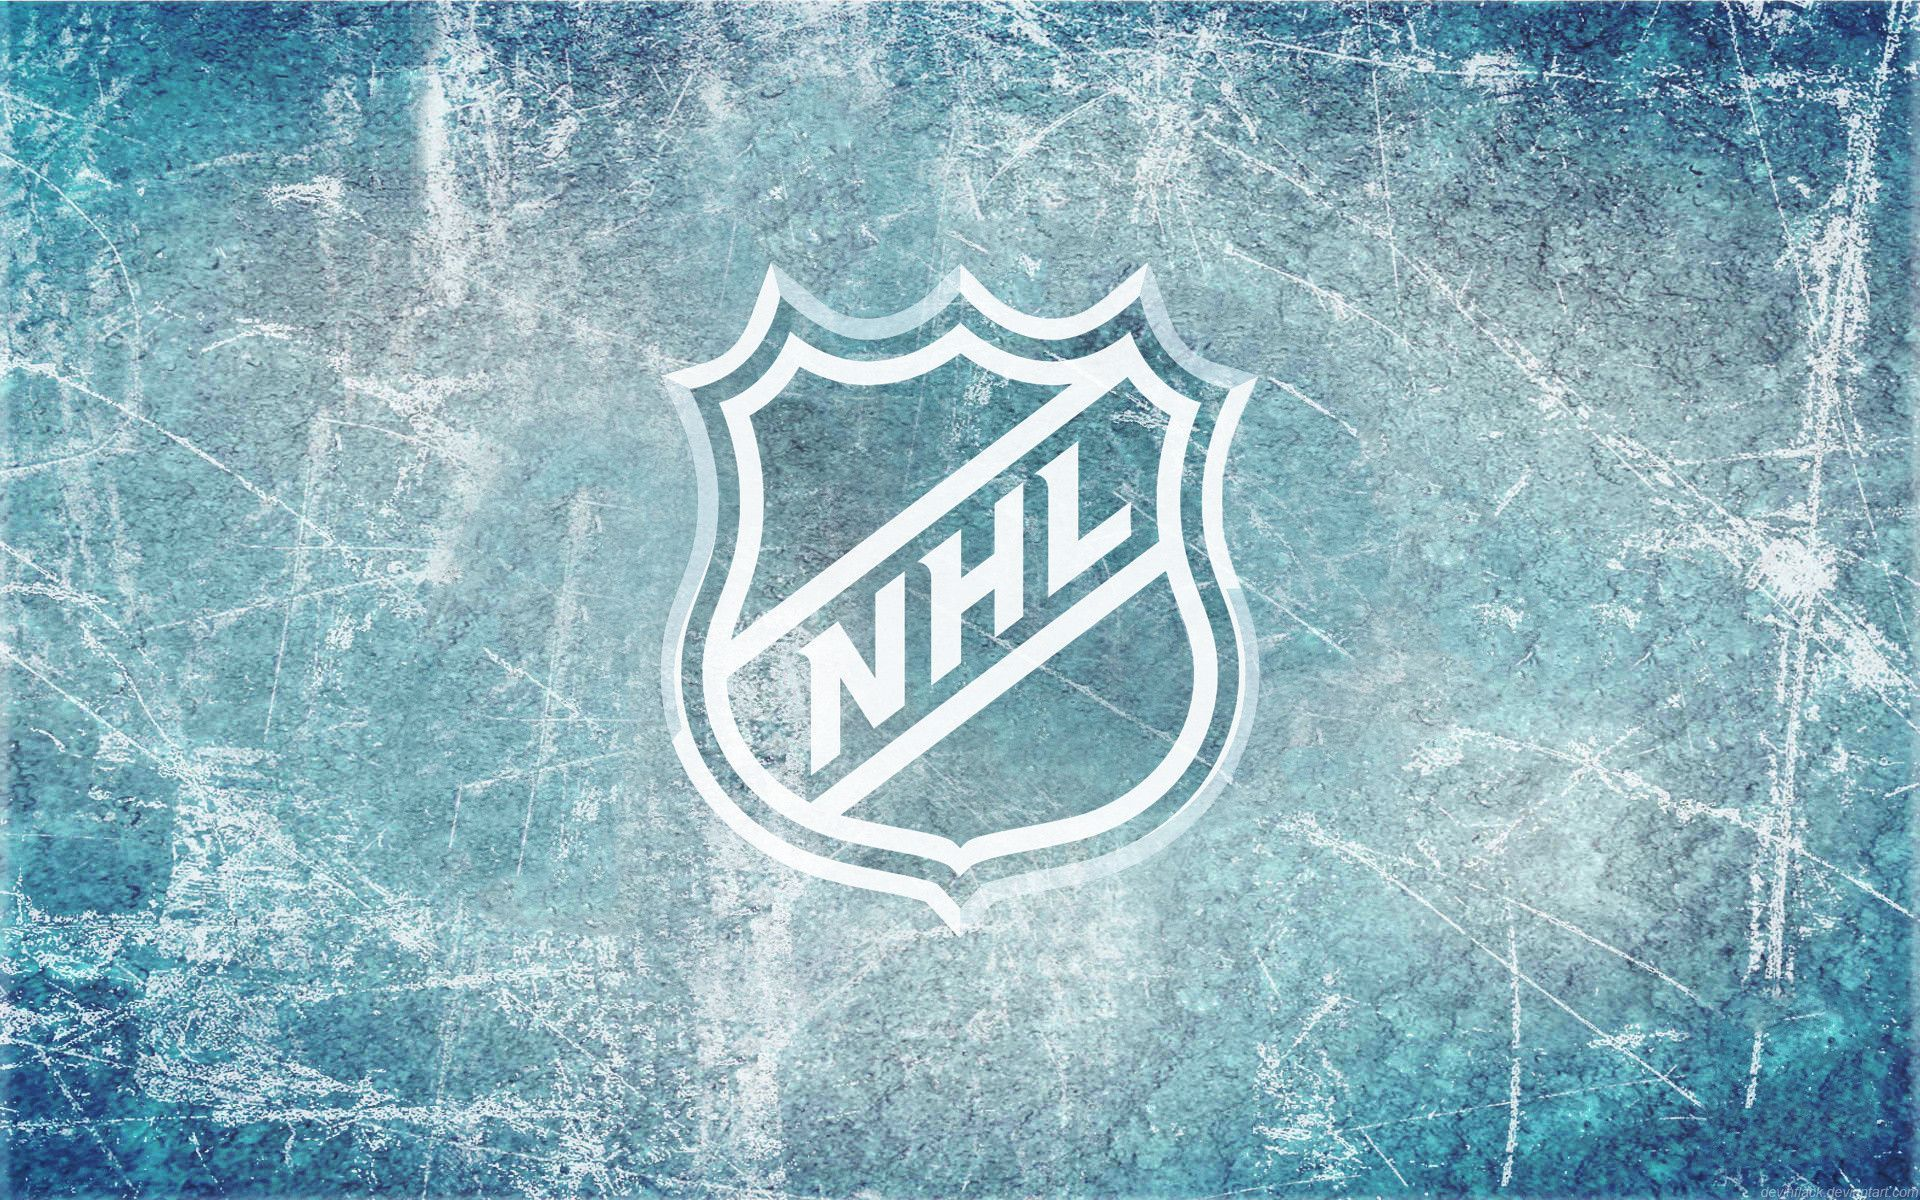 Field Hockey Wallpapers HD Download 1920x1200 44